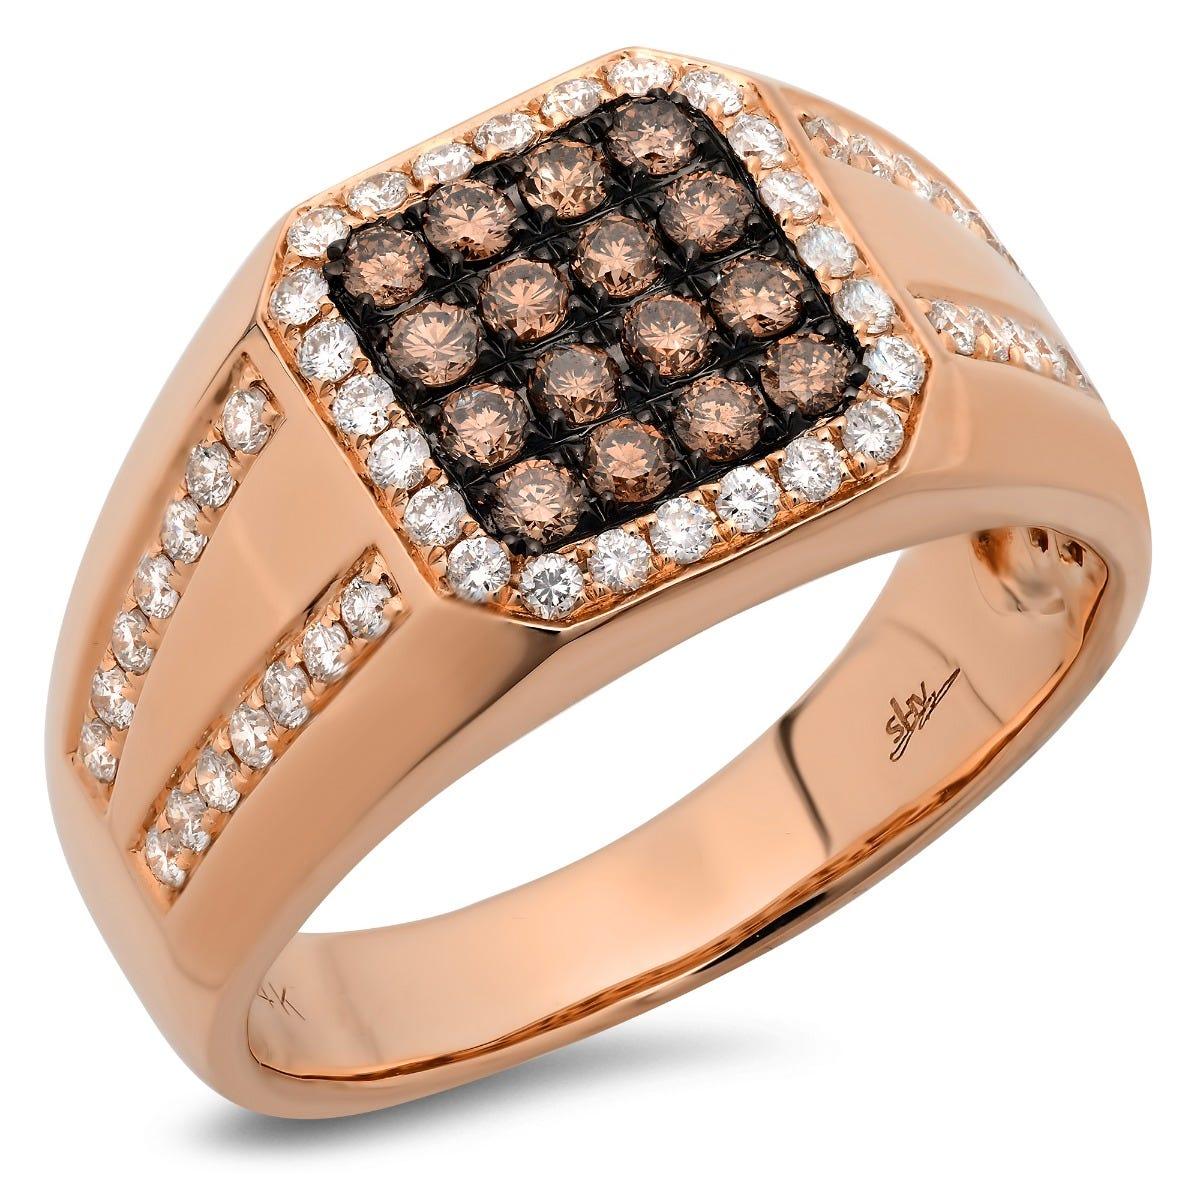 Shy Creation Men's White & Champagne Diamond Men's Ring in 14k Rose Gold SC28022907